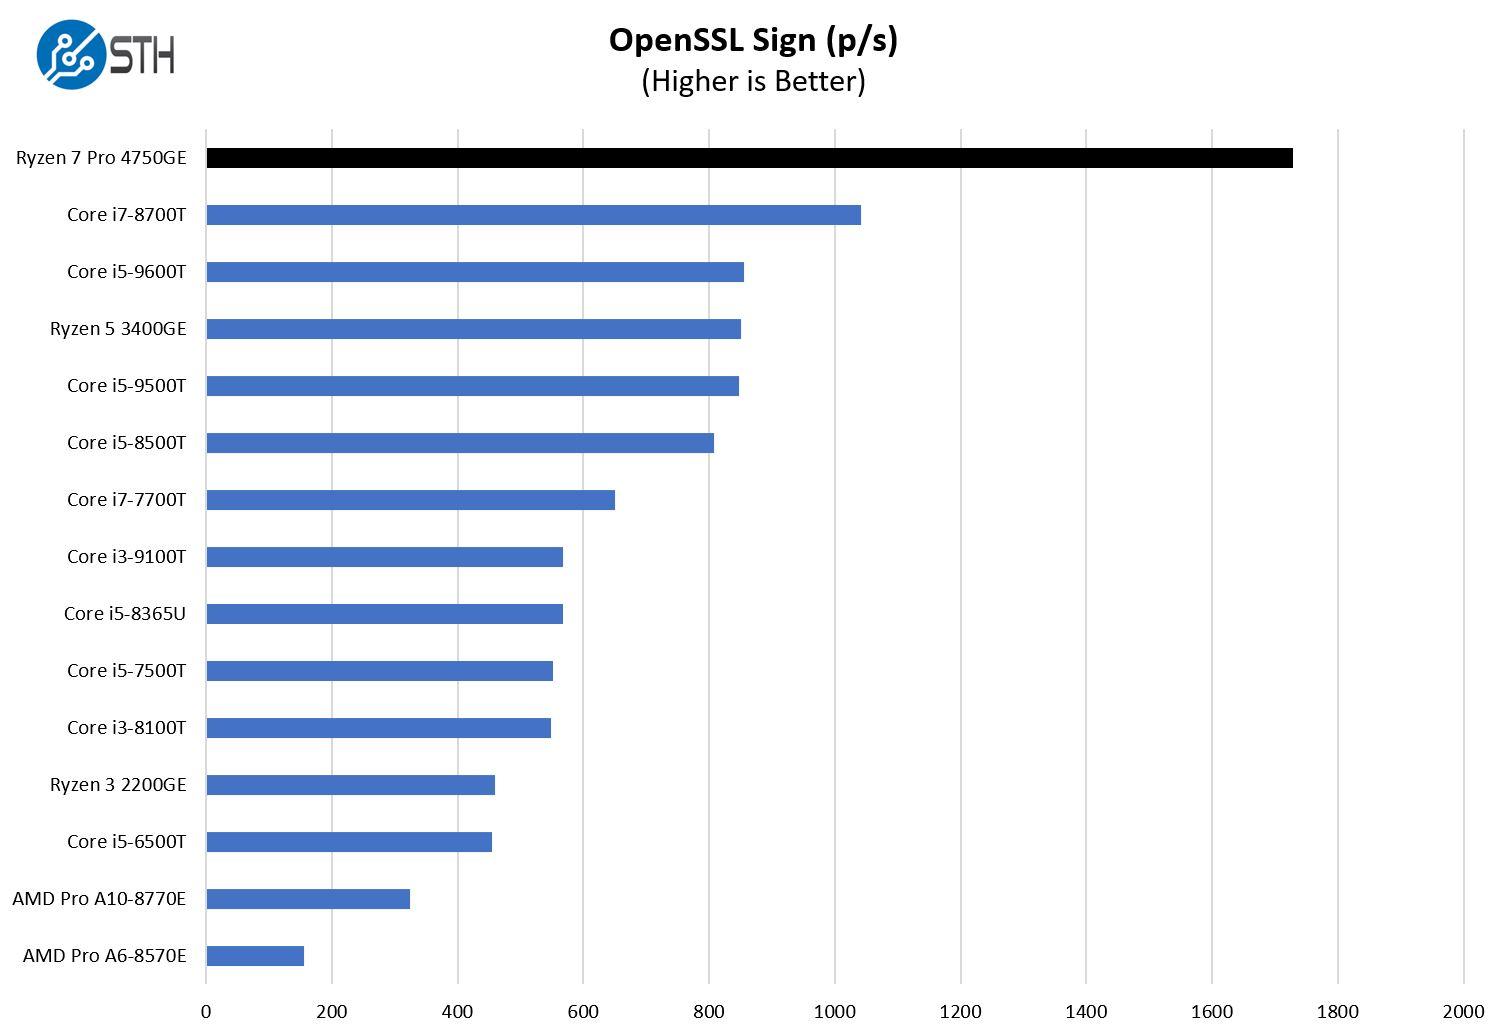 AMD Ryzen 7 Pro 4750GE OpenSSL Sign Benchmark